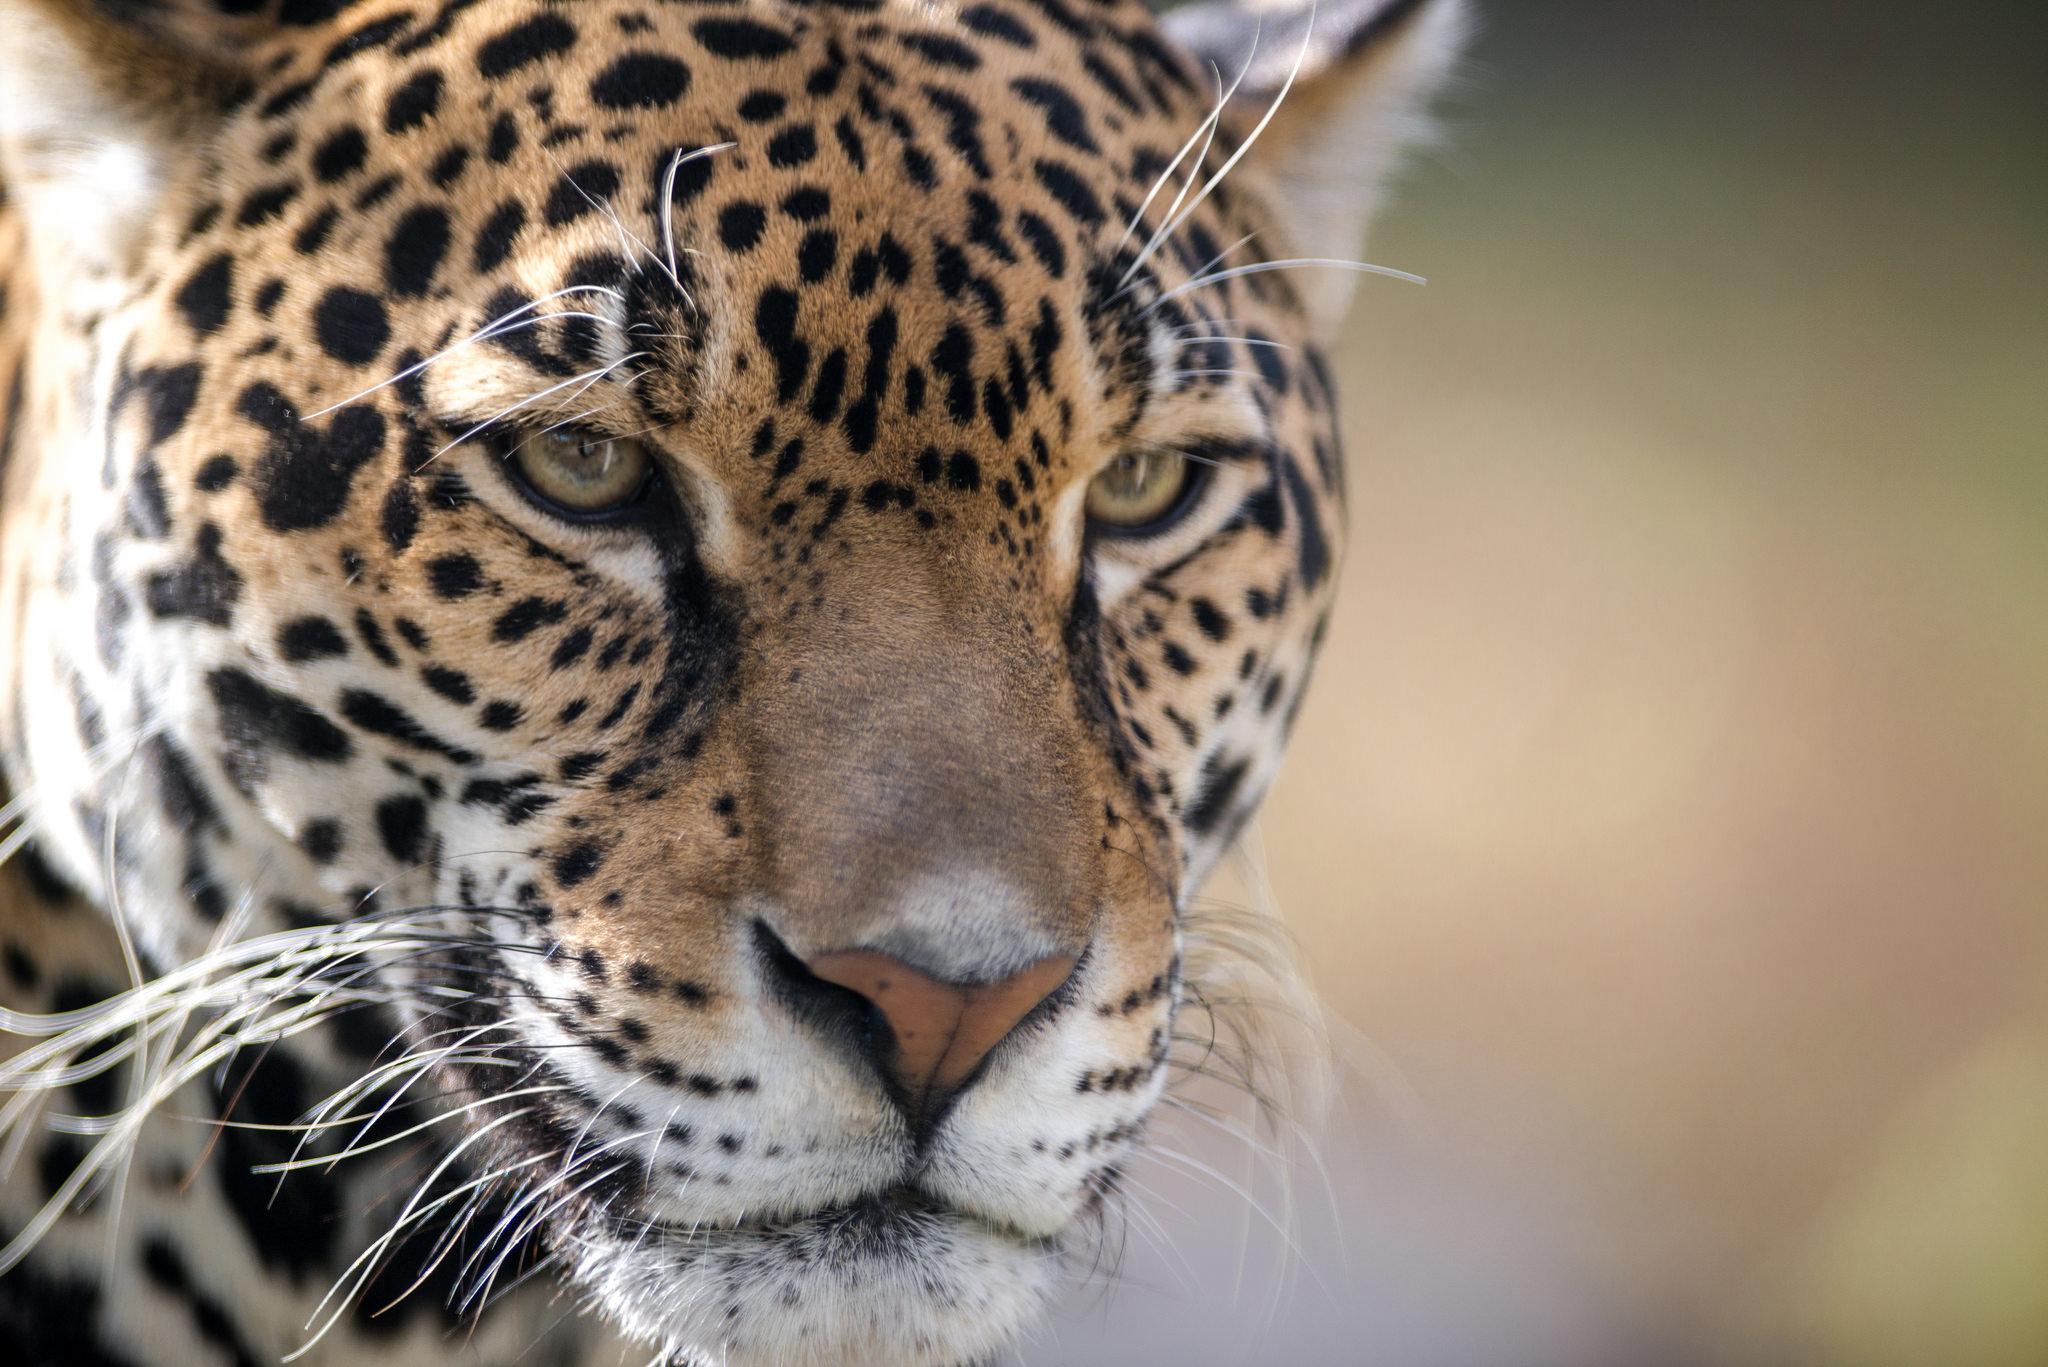 jaguar-closeup-portrait-kilby-2015-1.jpg